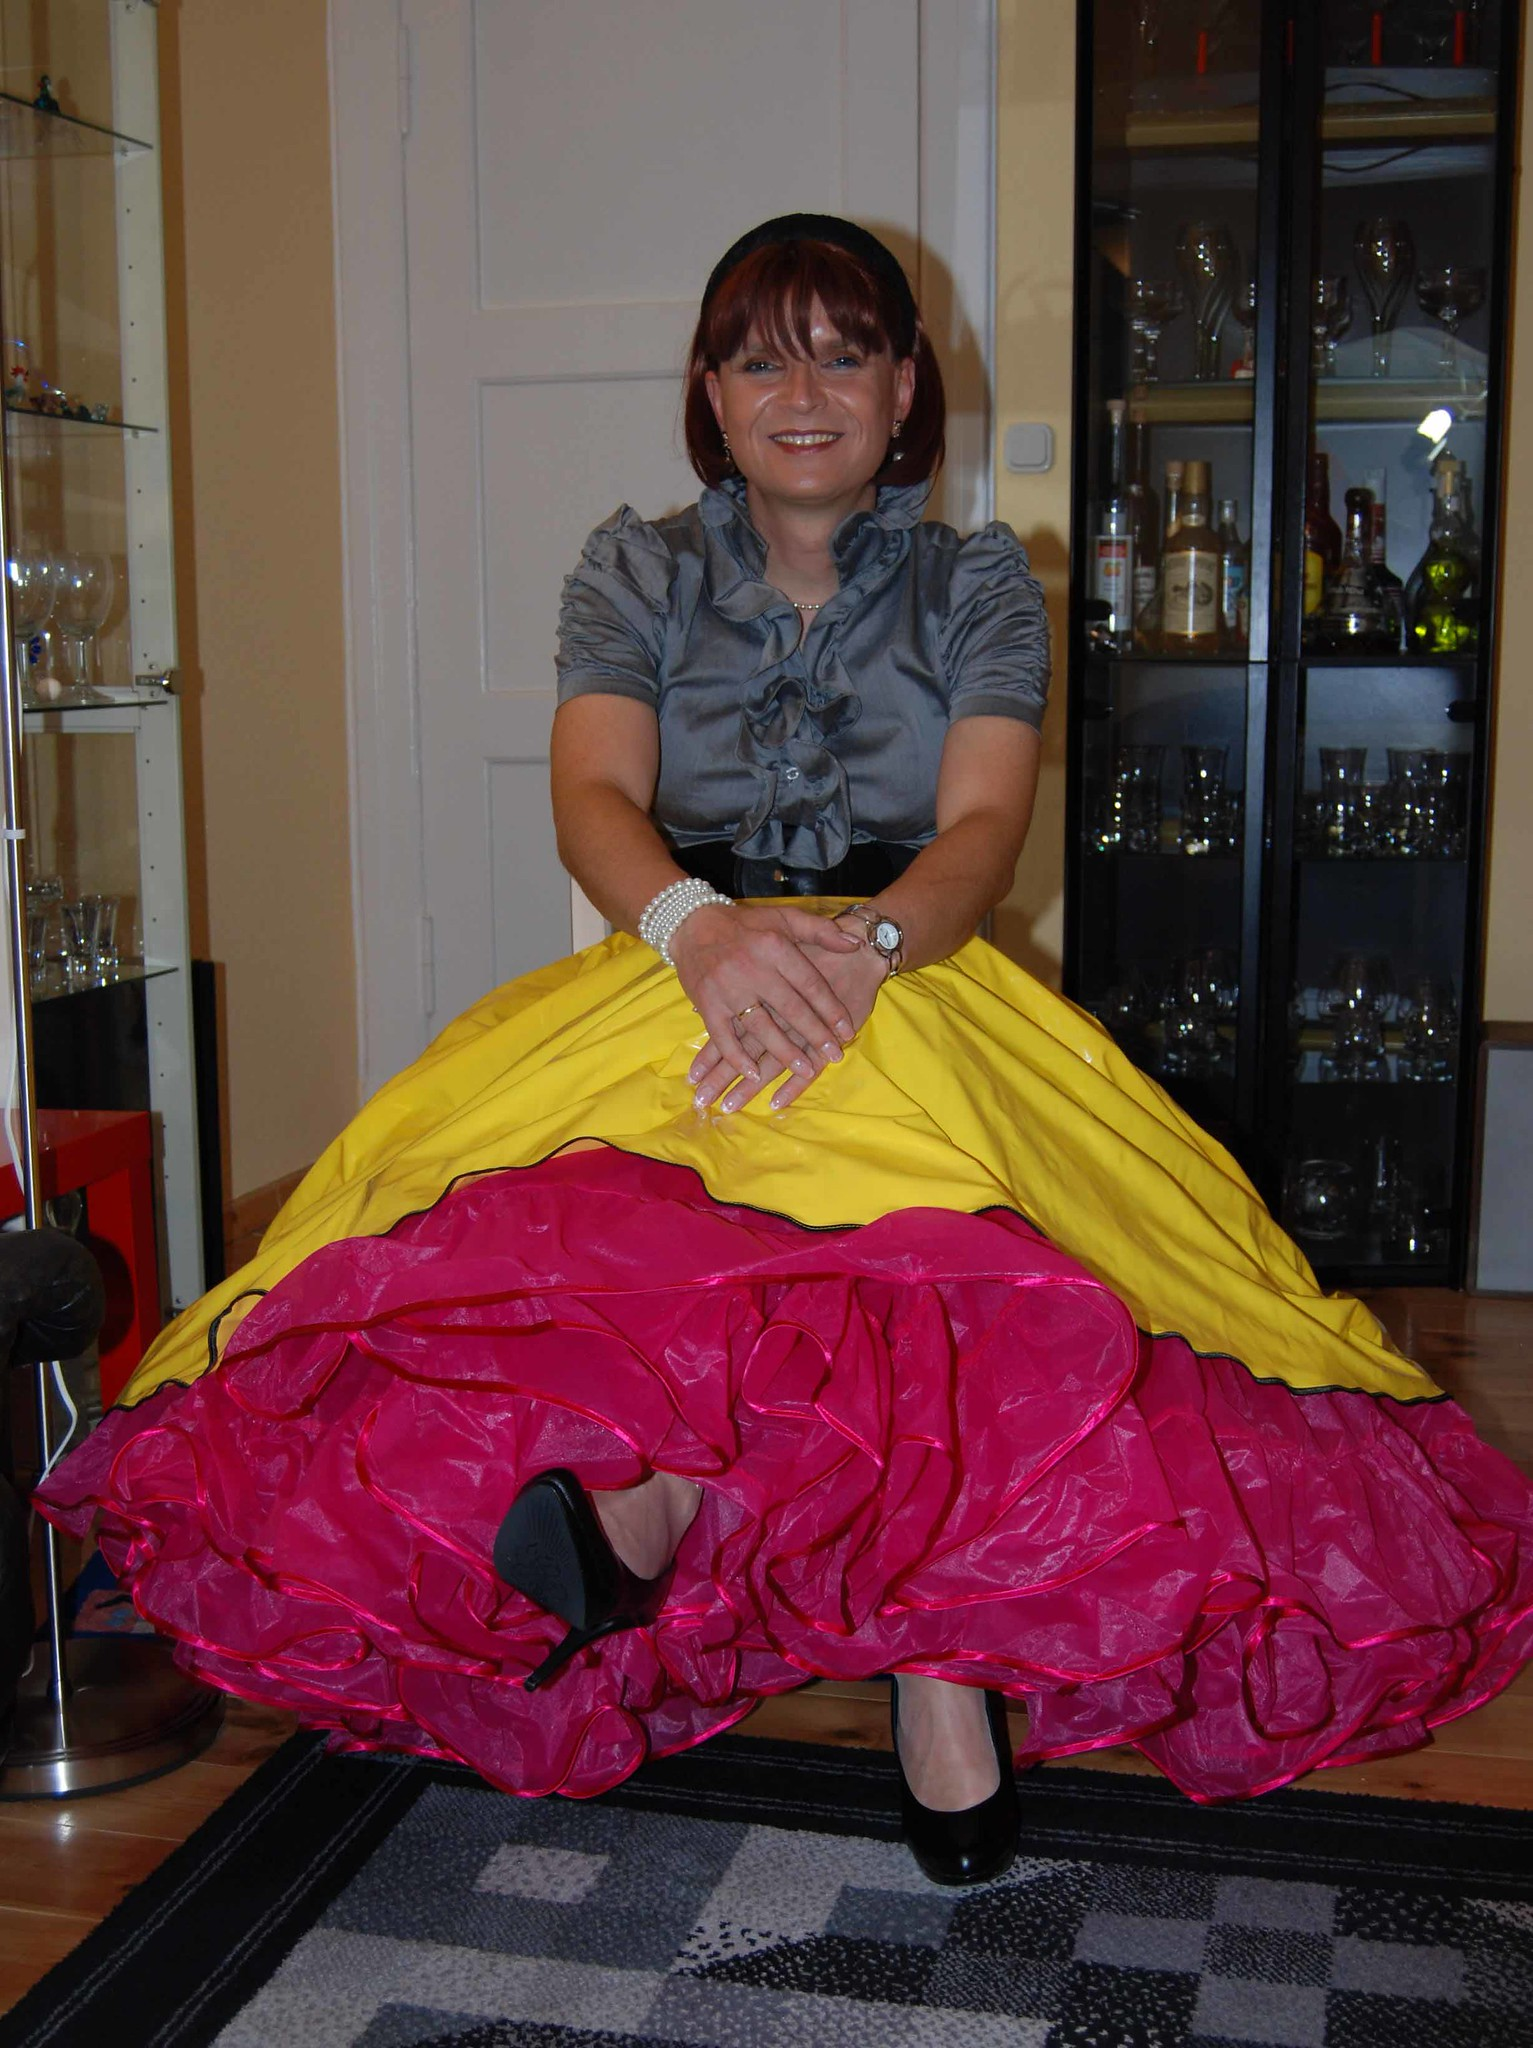 petticoat punishment dresses fashion dresses. Black Bedroom Furniture Sets. Home Design Ideas